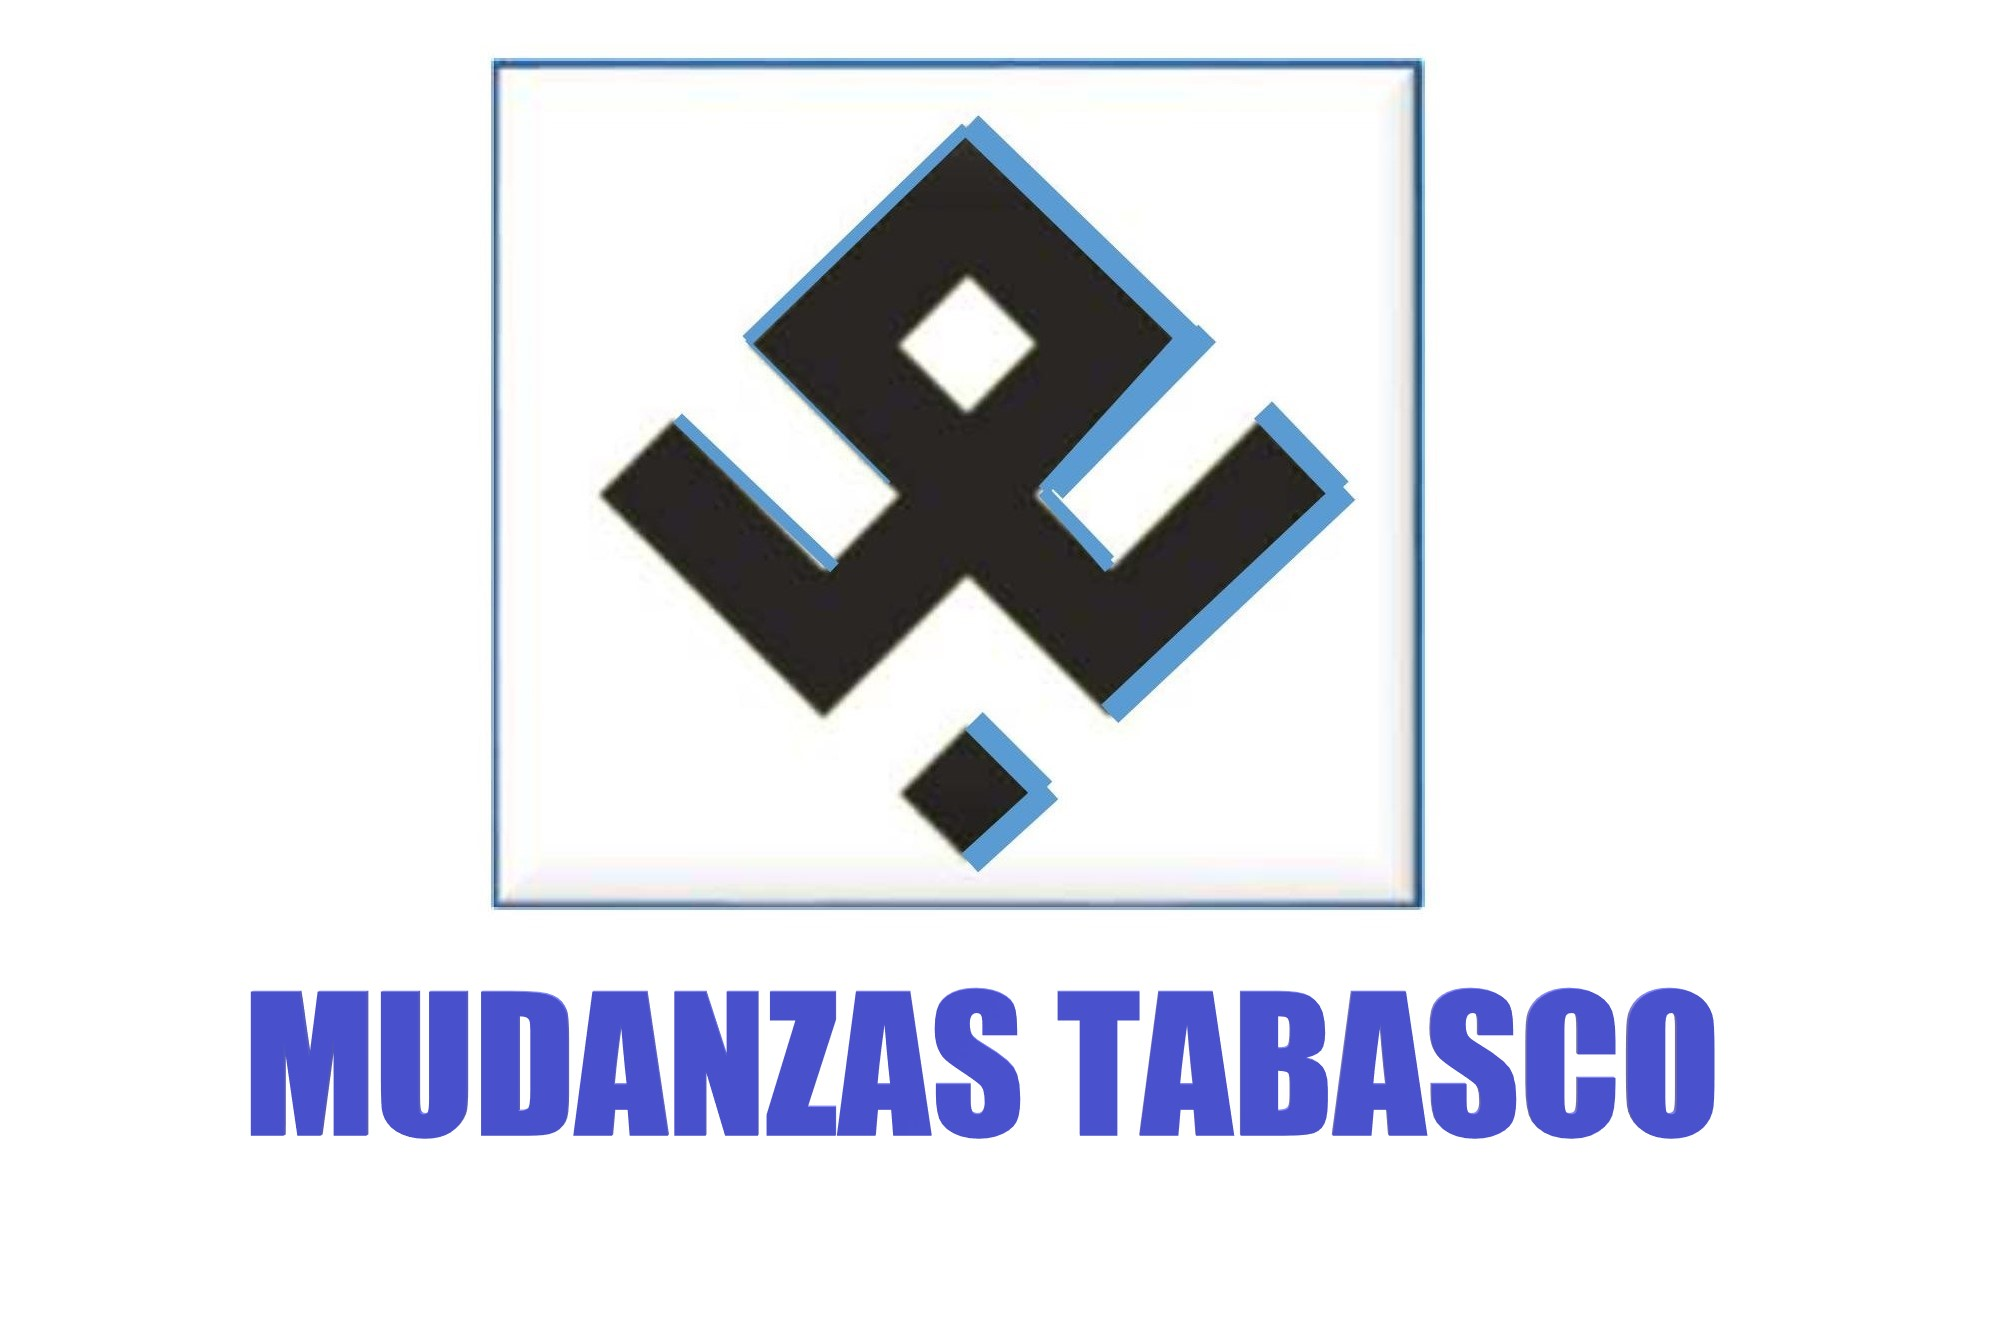 Mudanzas Tabasco